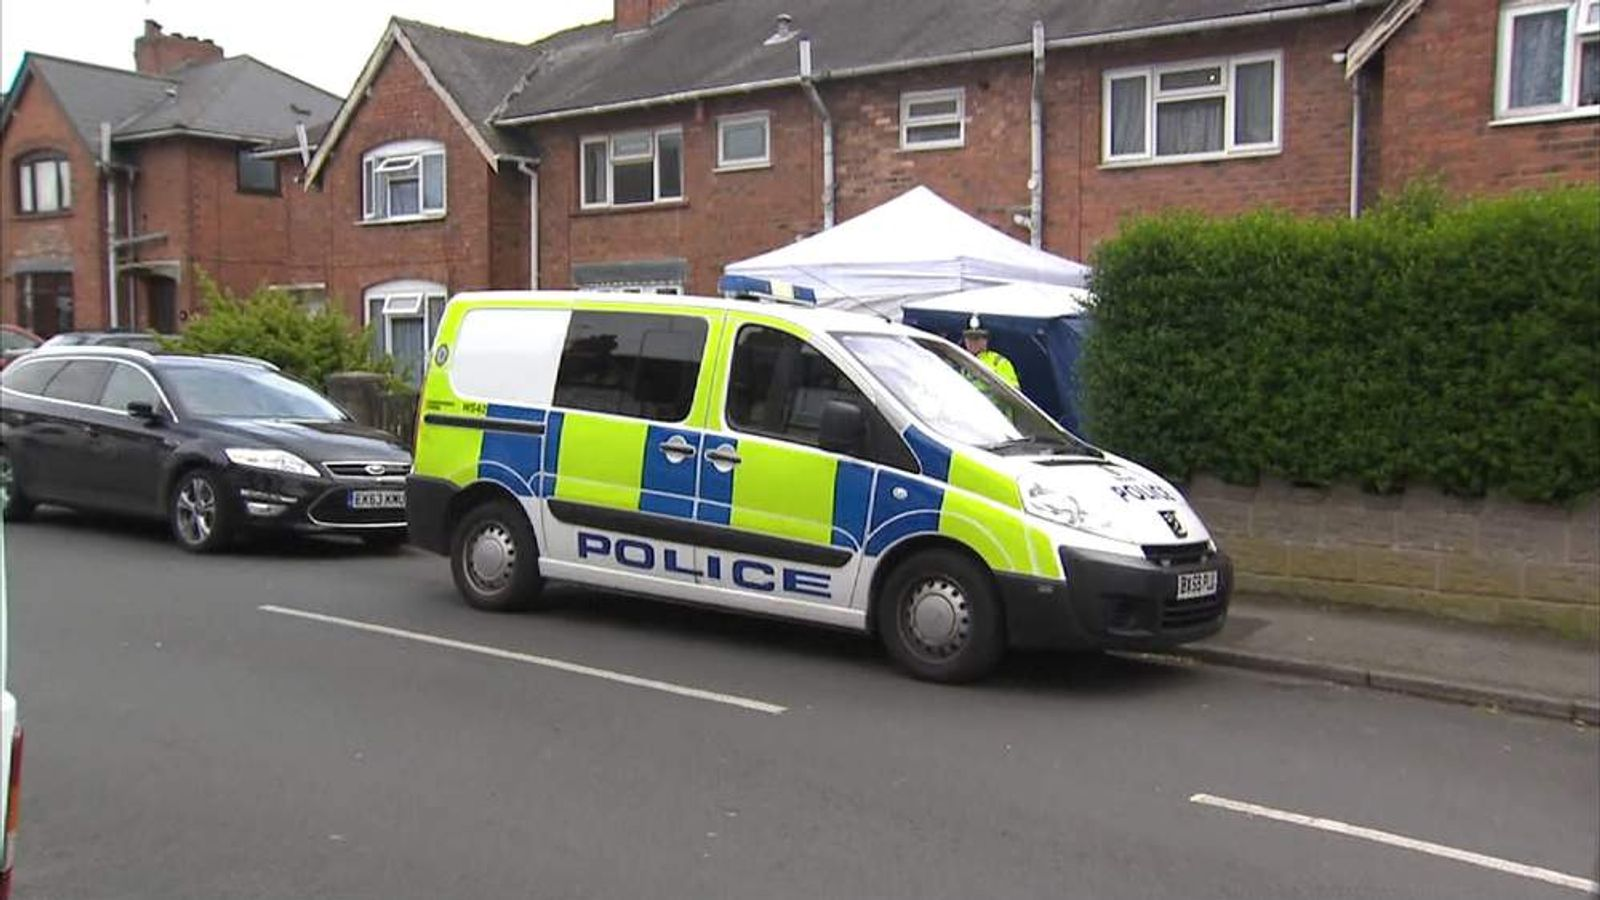 House where two found dead, three children found unharmed